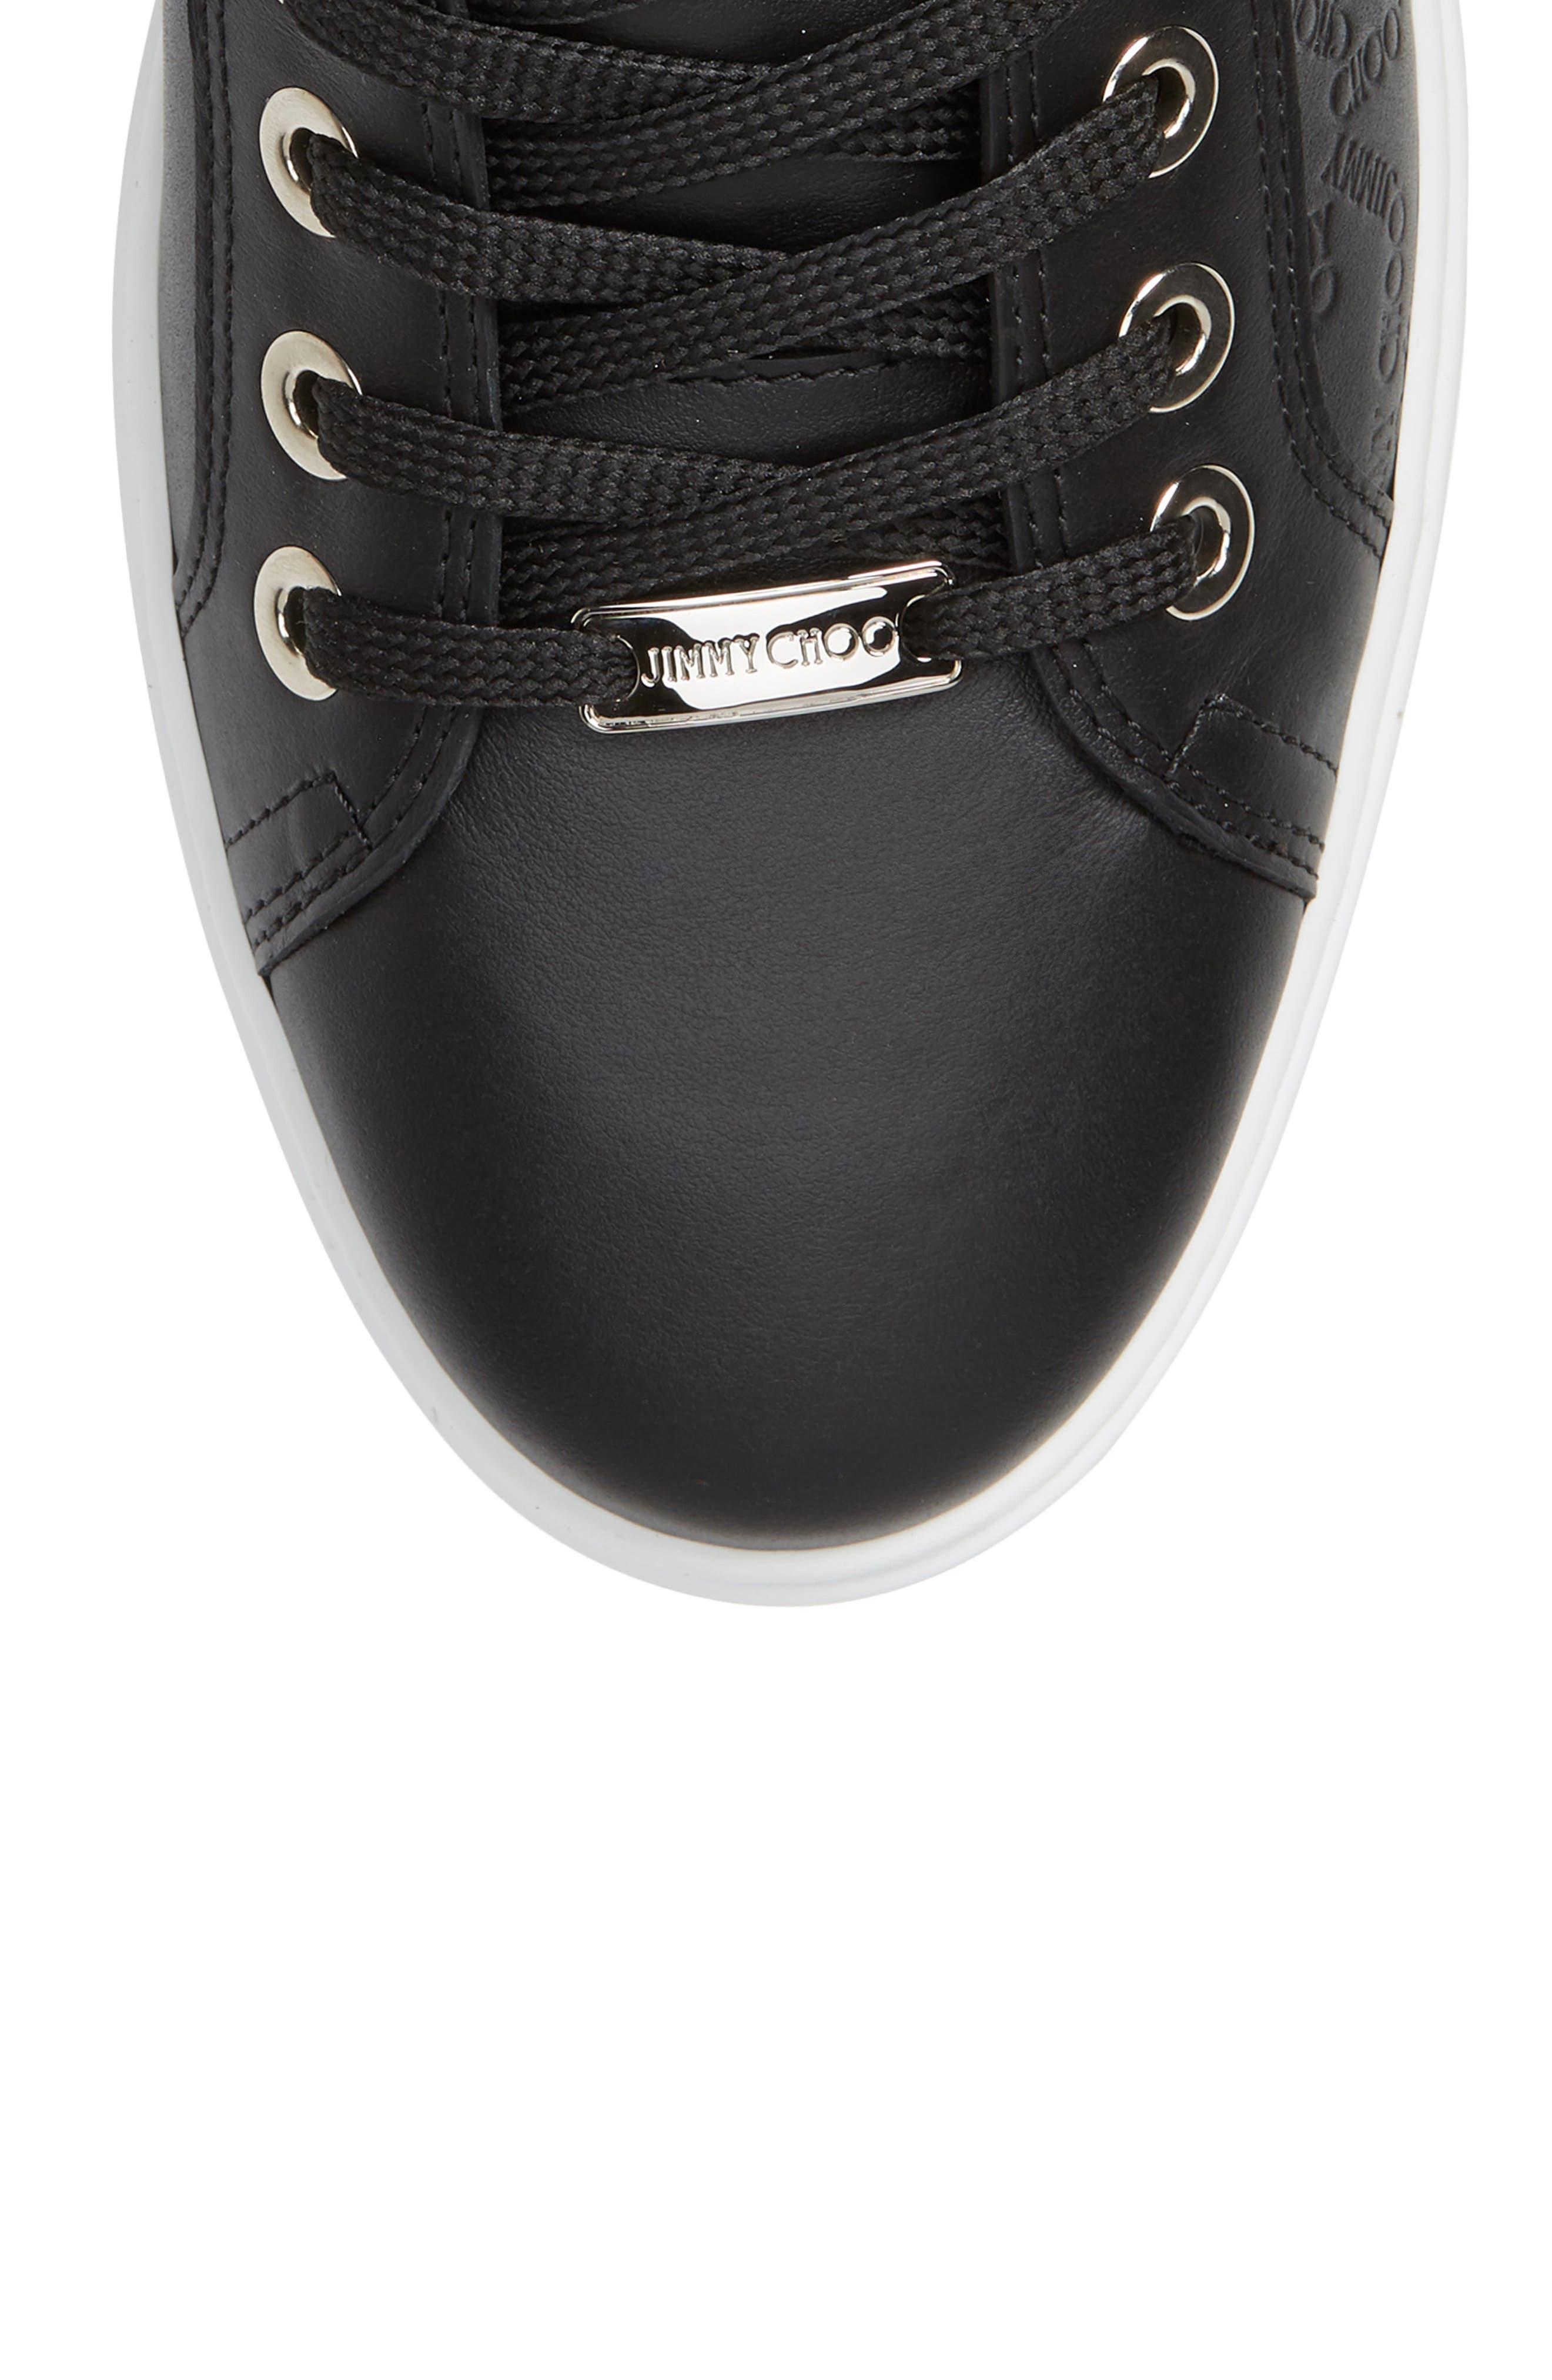 JIMMY CHOO, Colt High Top Sneaker, Alternate thumbnail 5, color, BLACK